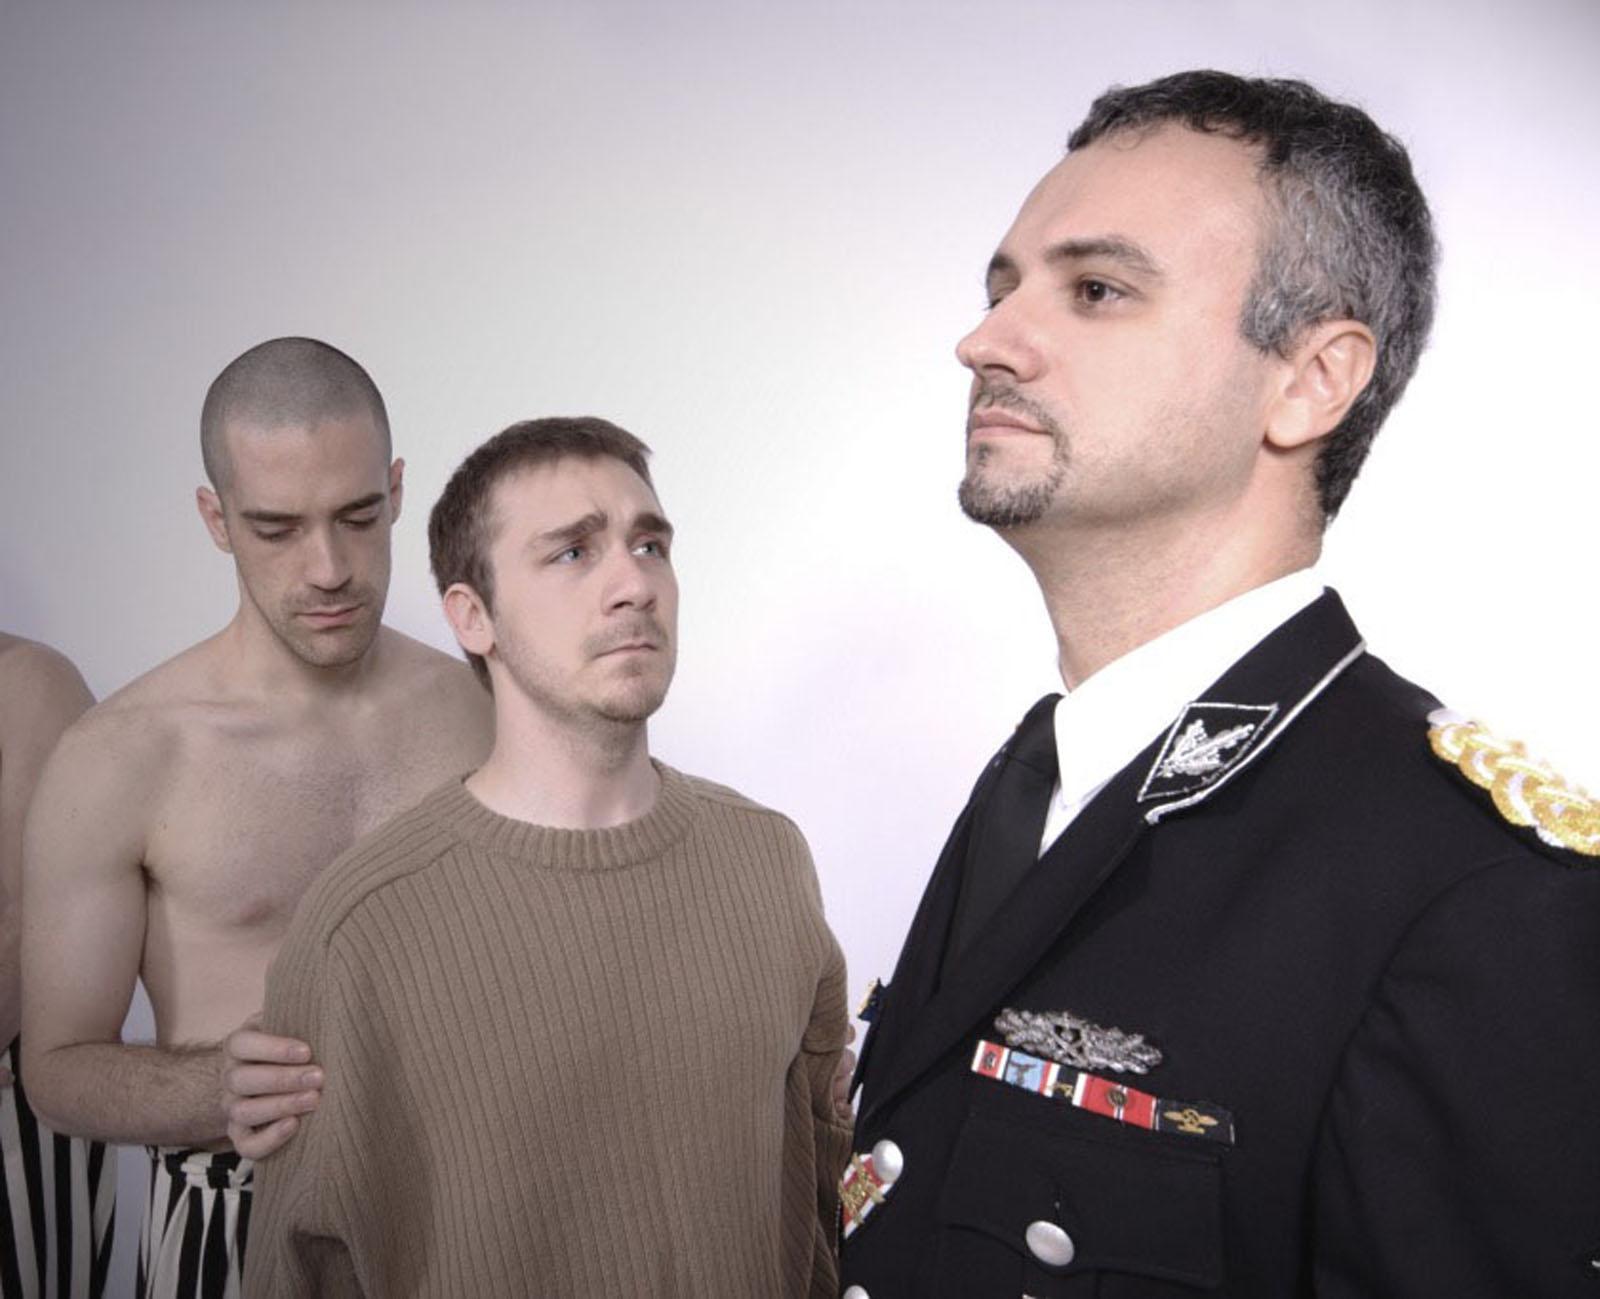 eskort gay män helsingborg student eskort